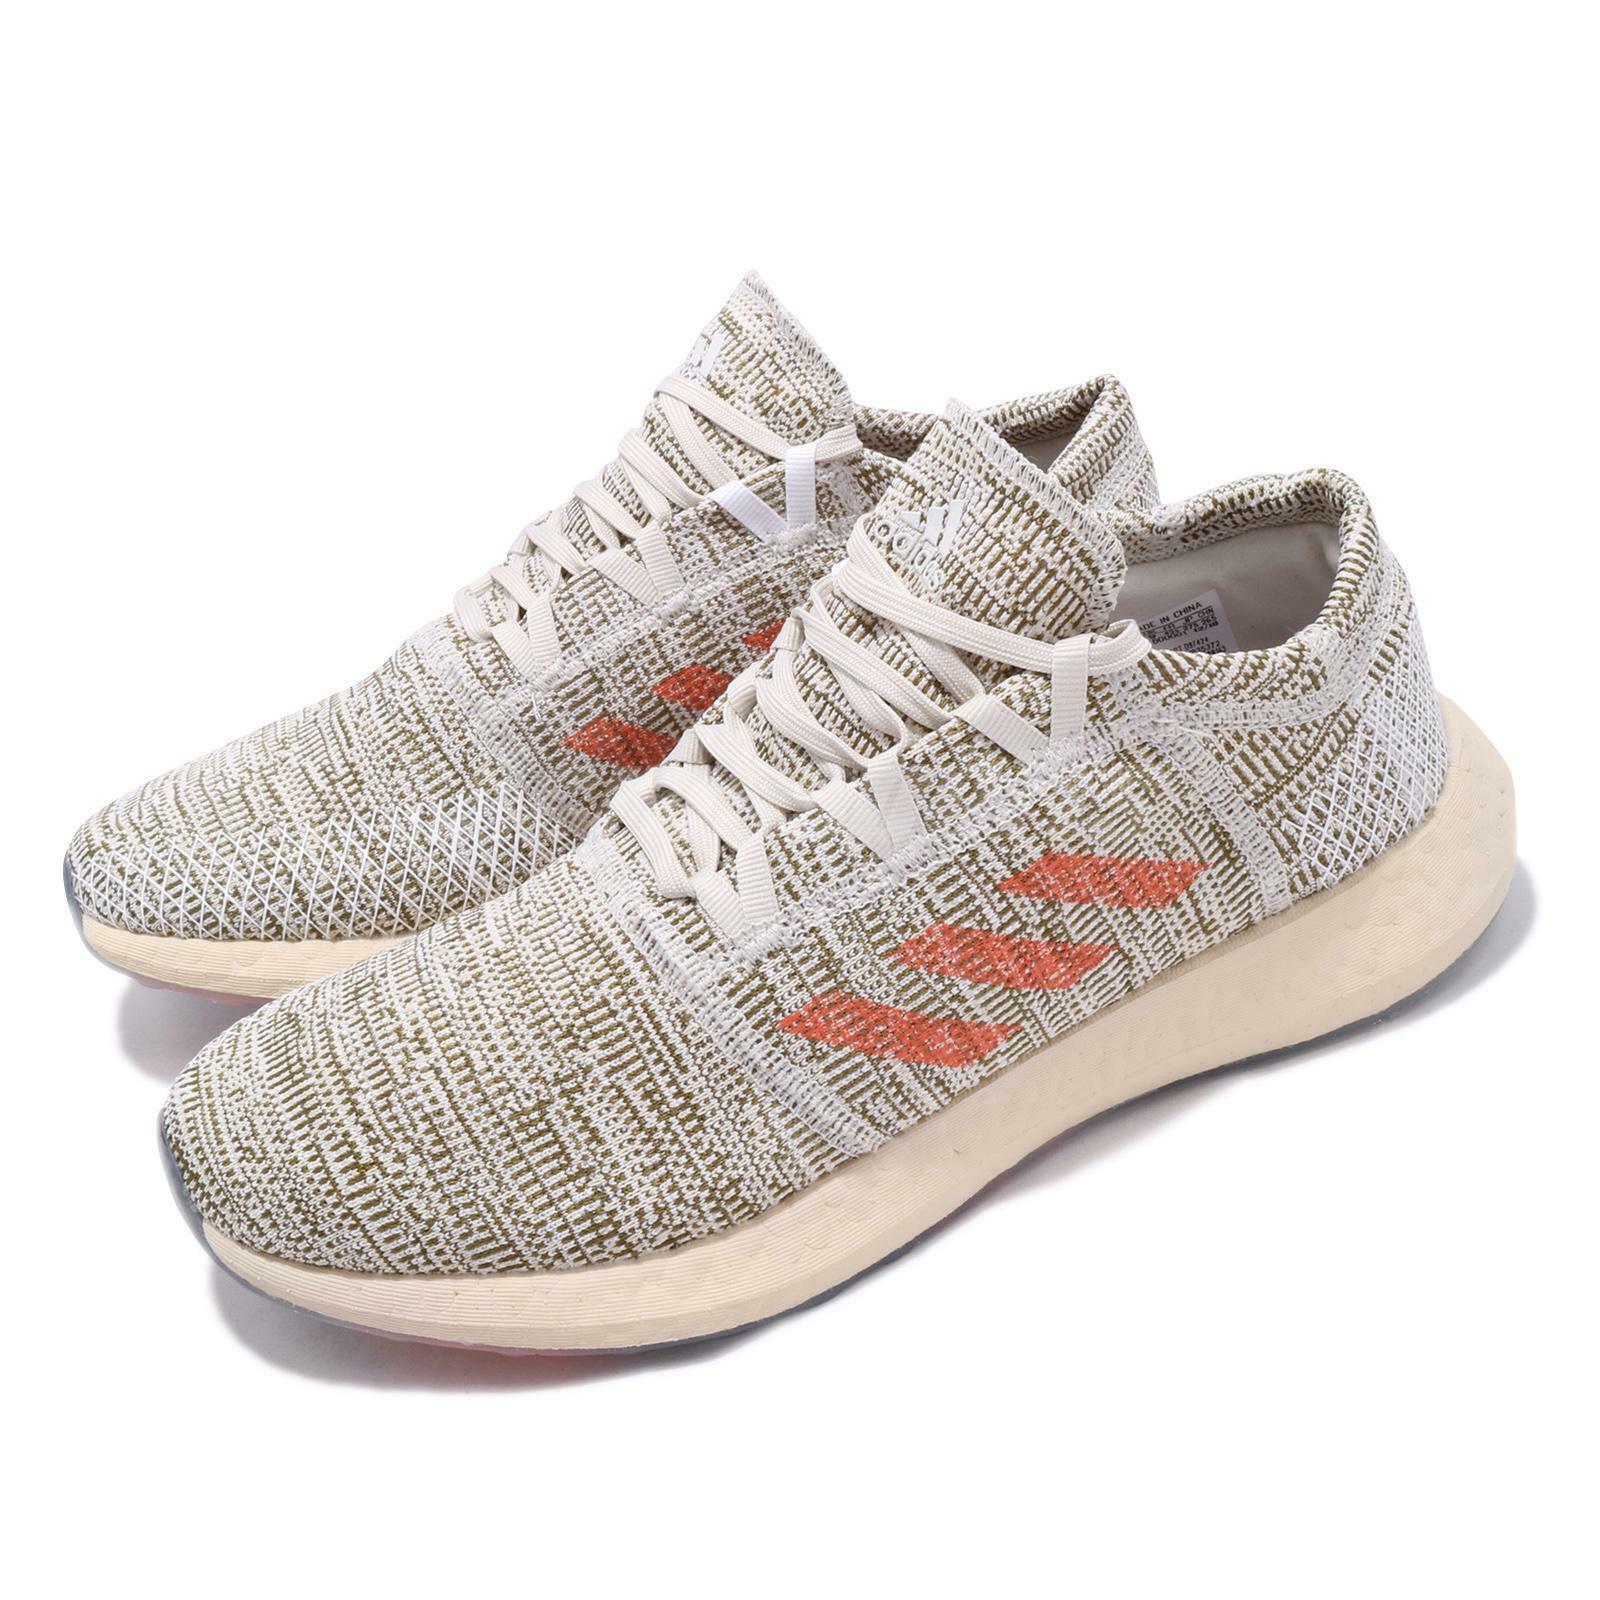 Adidas Pureboost Go LTD Raw White orange Trace Cargo Men Running shoes D97424